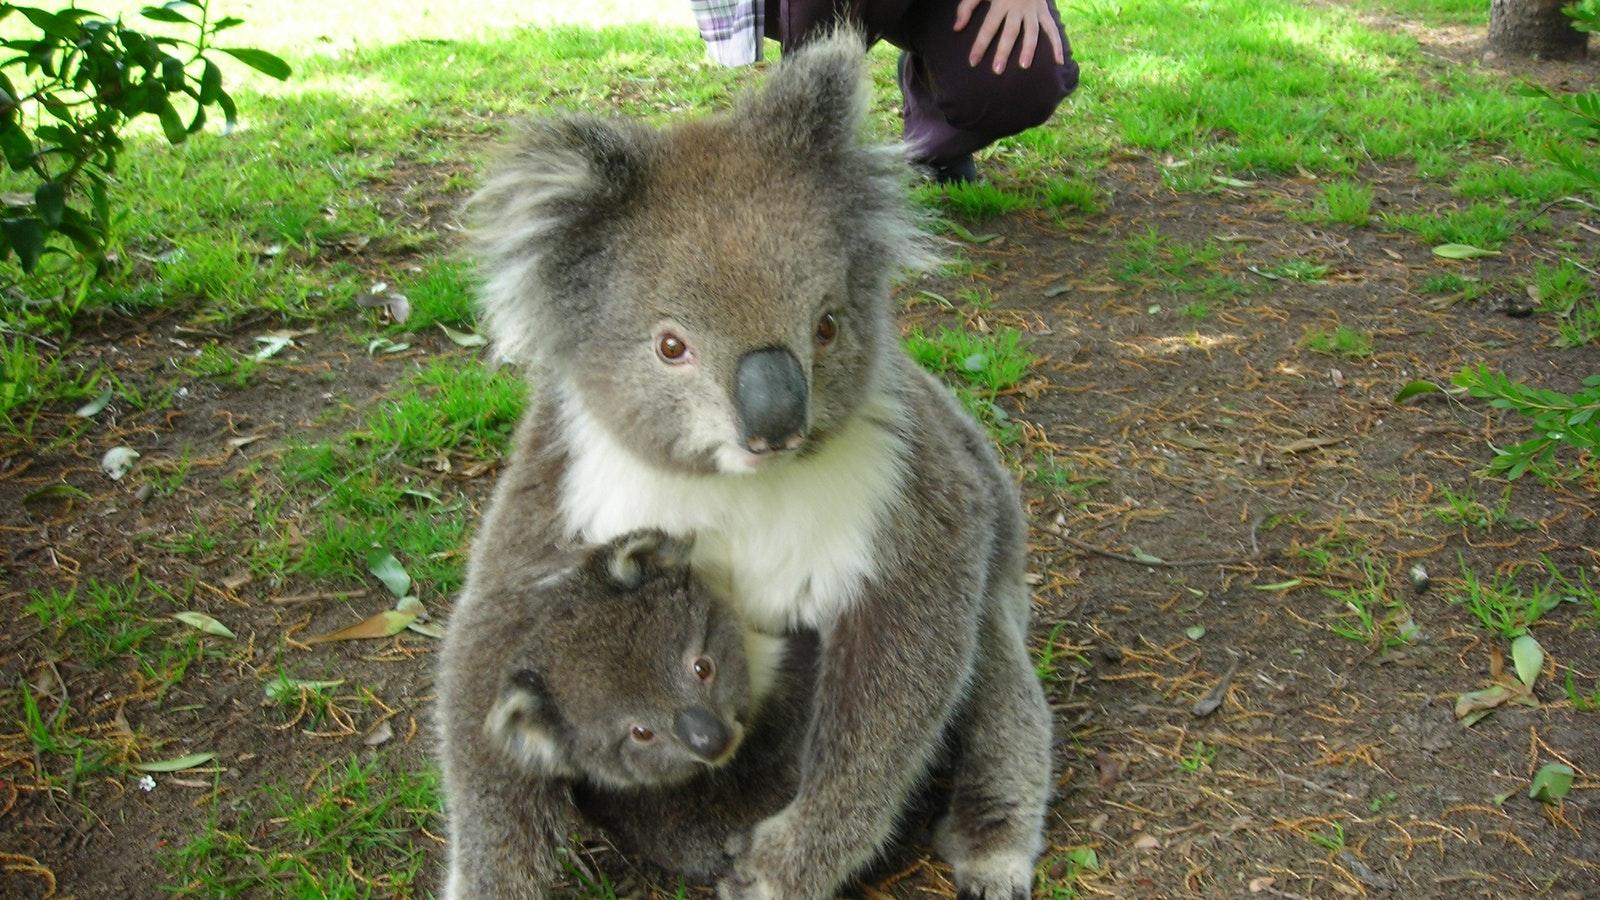 Koala and joey, Kennett River